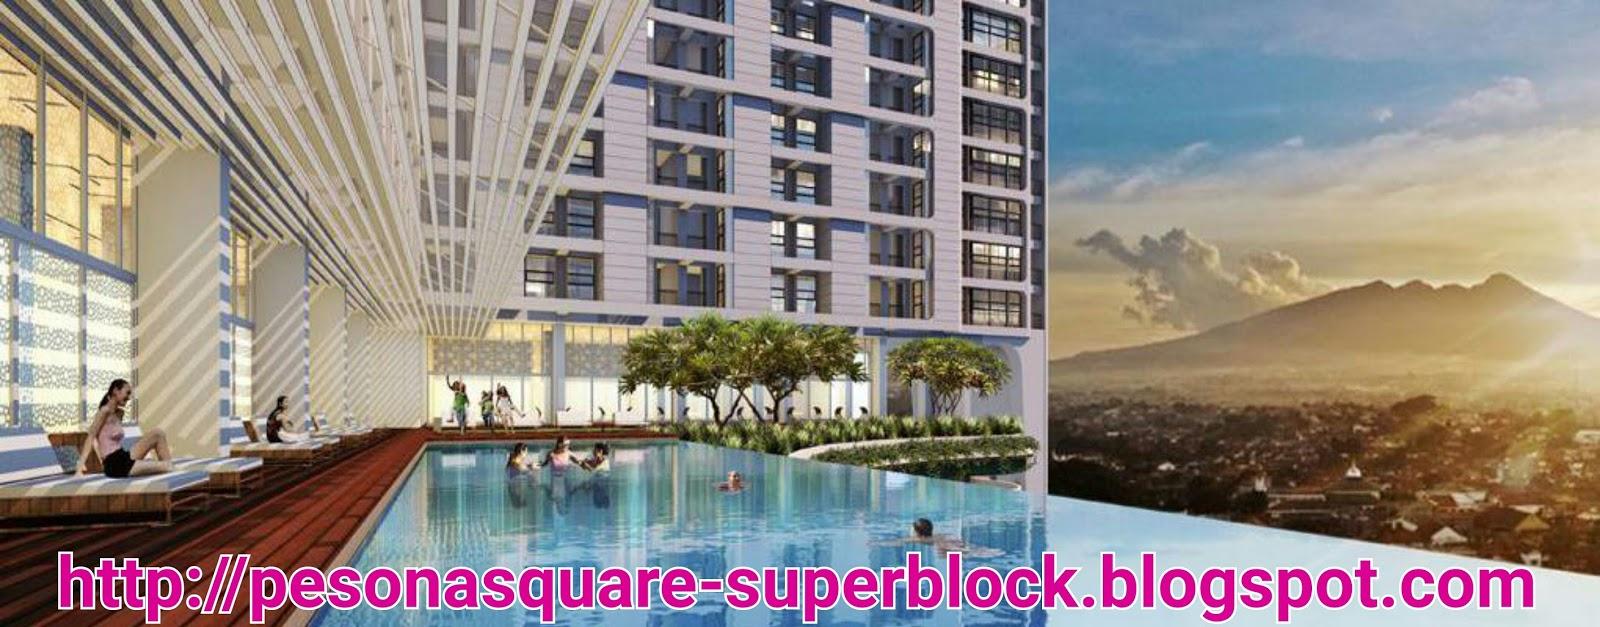 Marrakech Suites Apartment Mall Pesona Square Depok